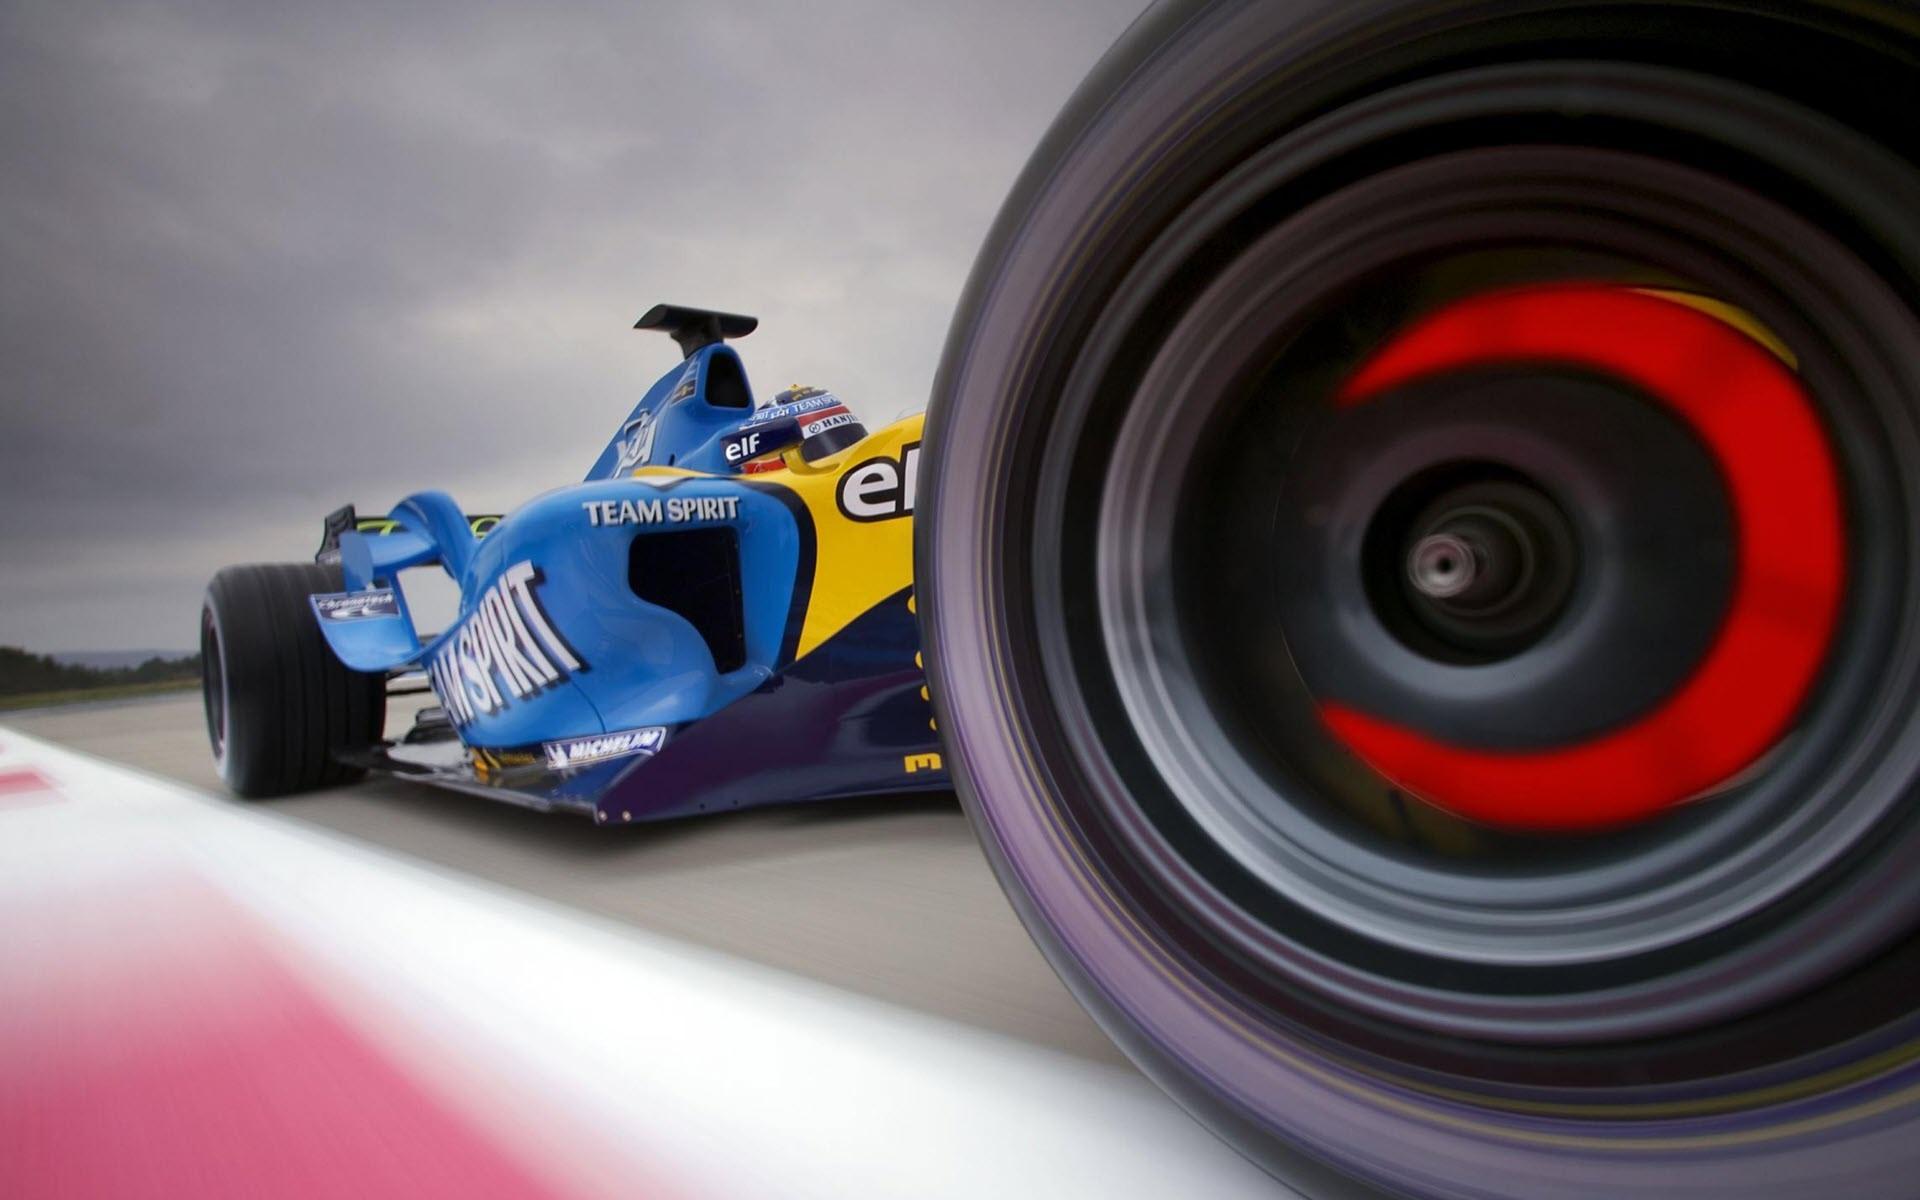 Team Spirit Formula 1 Wallpaper Desktop Wallpaper